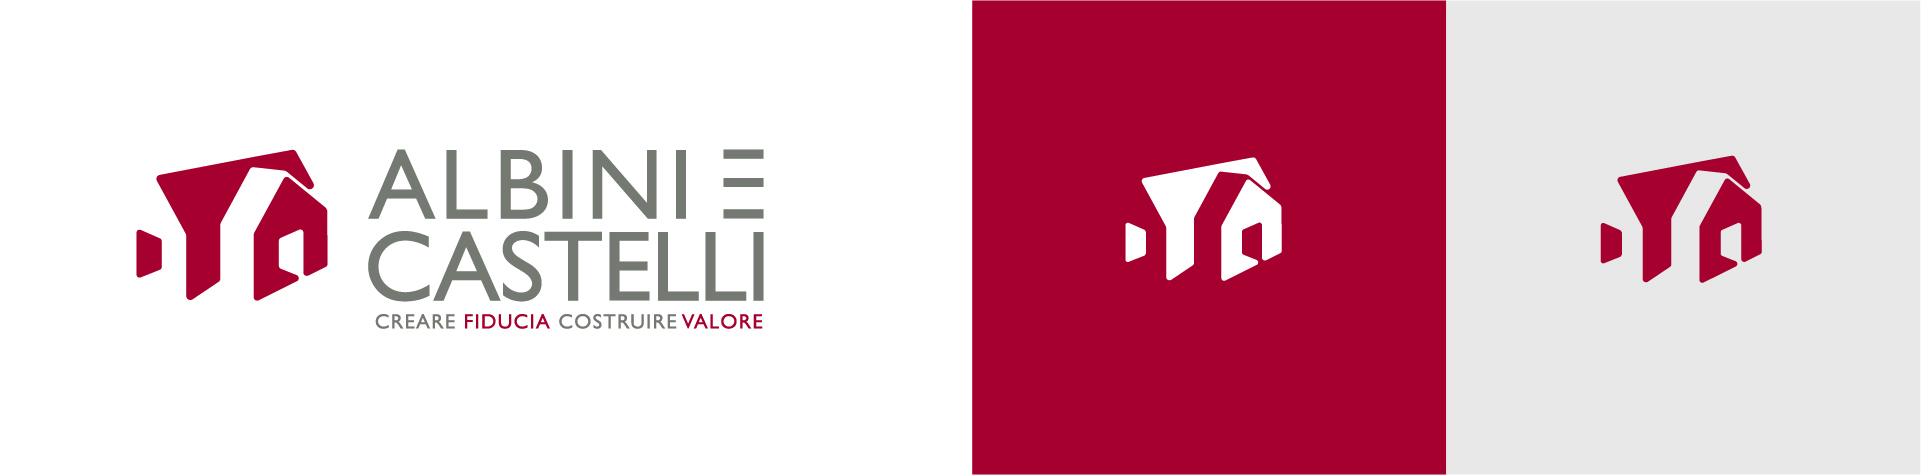 KFDS - Albini e Castelli Case Study Logo